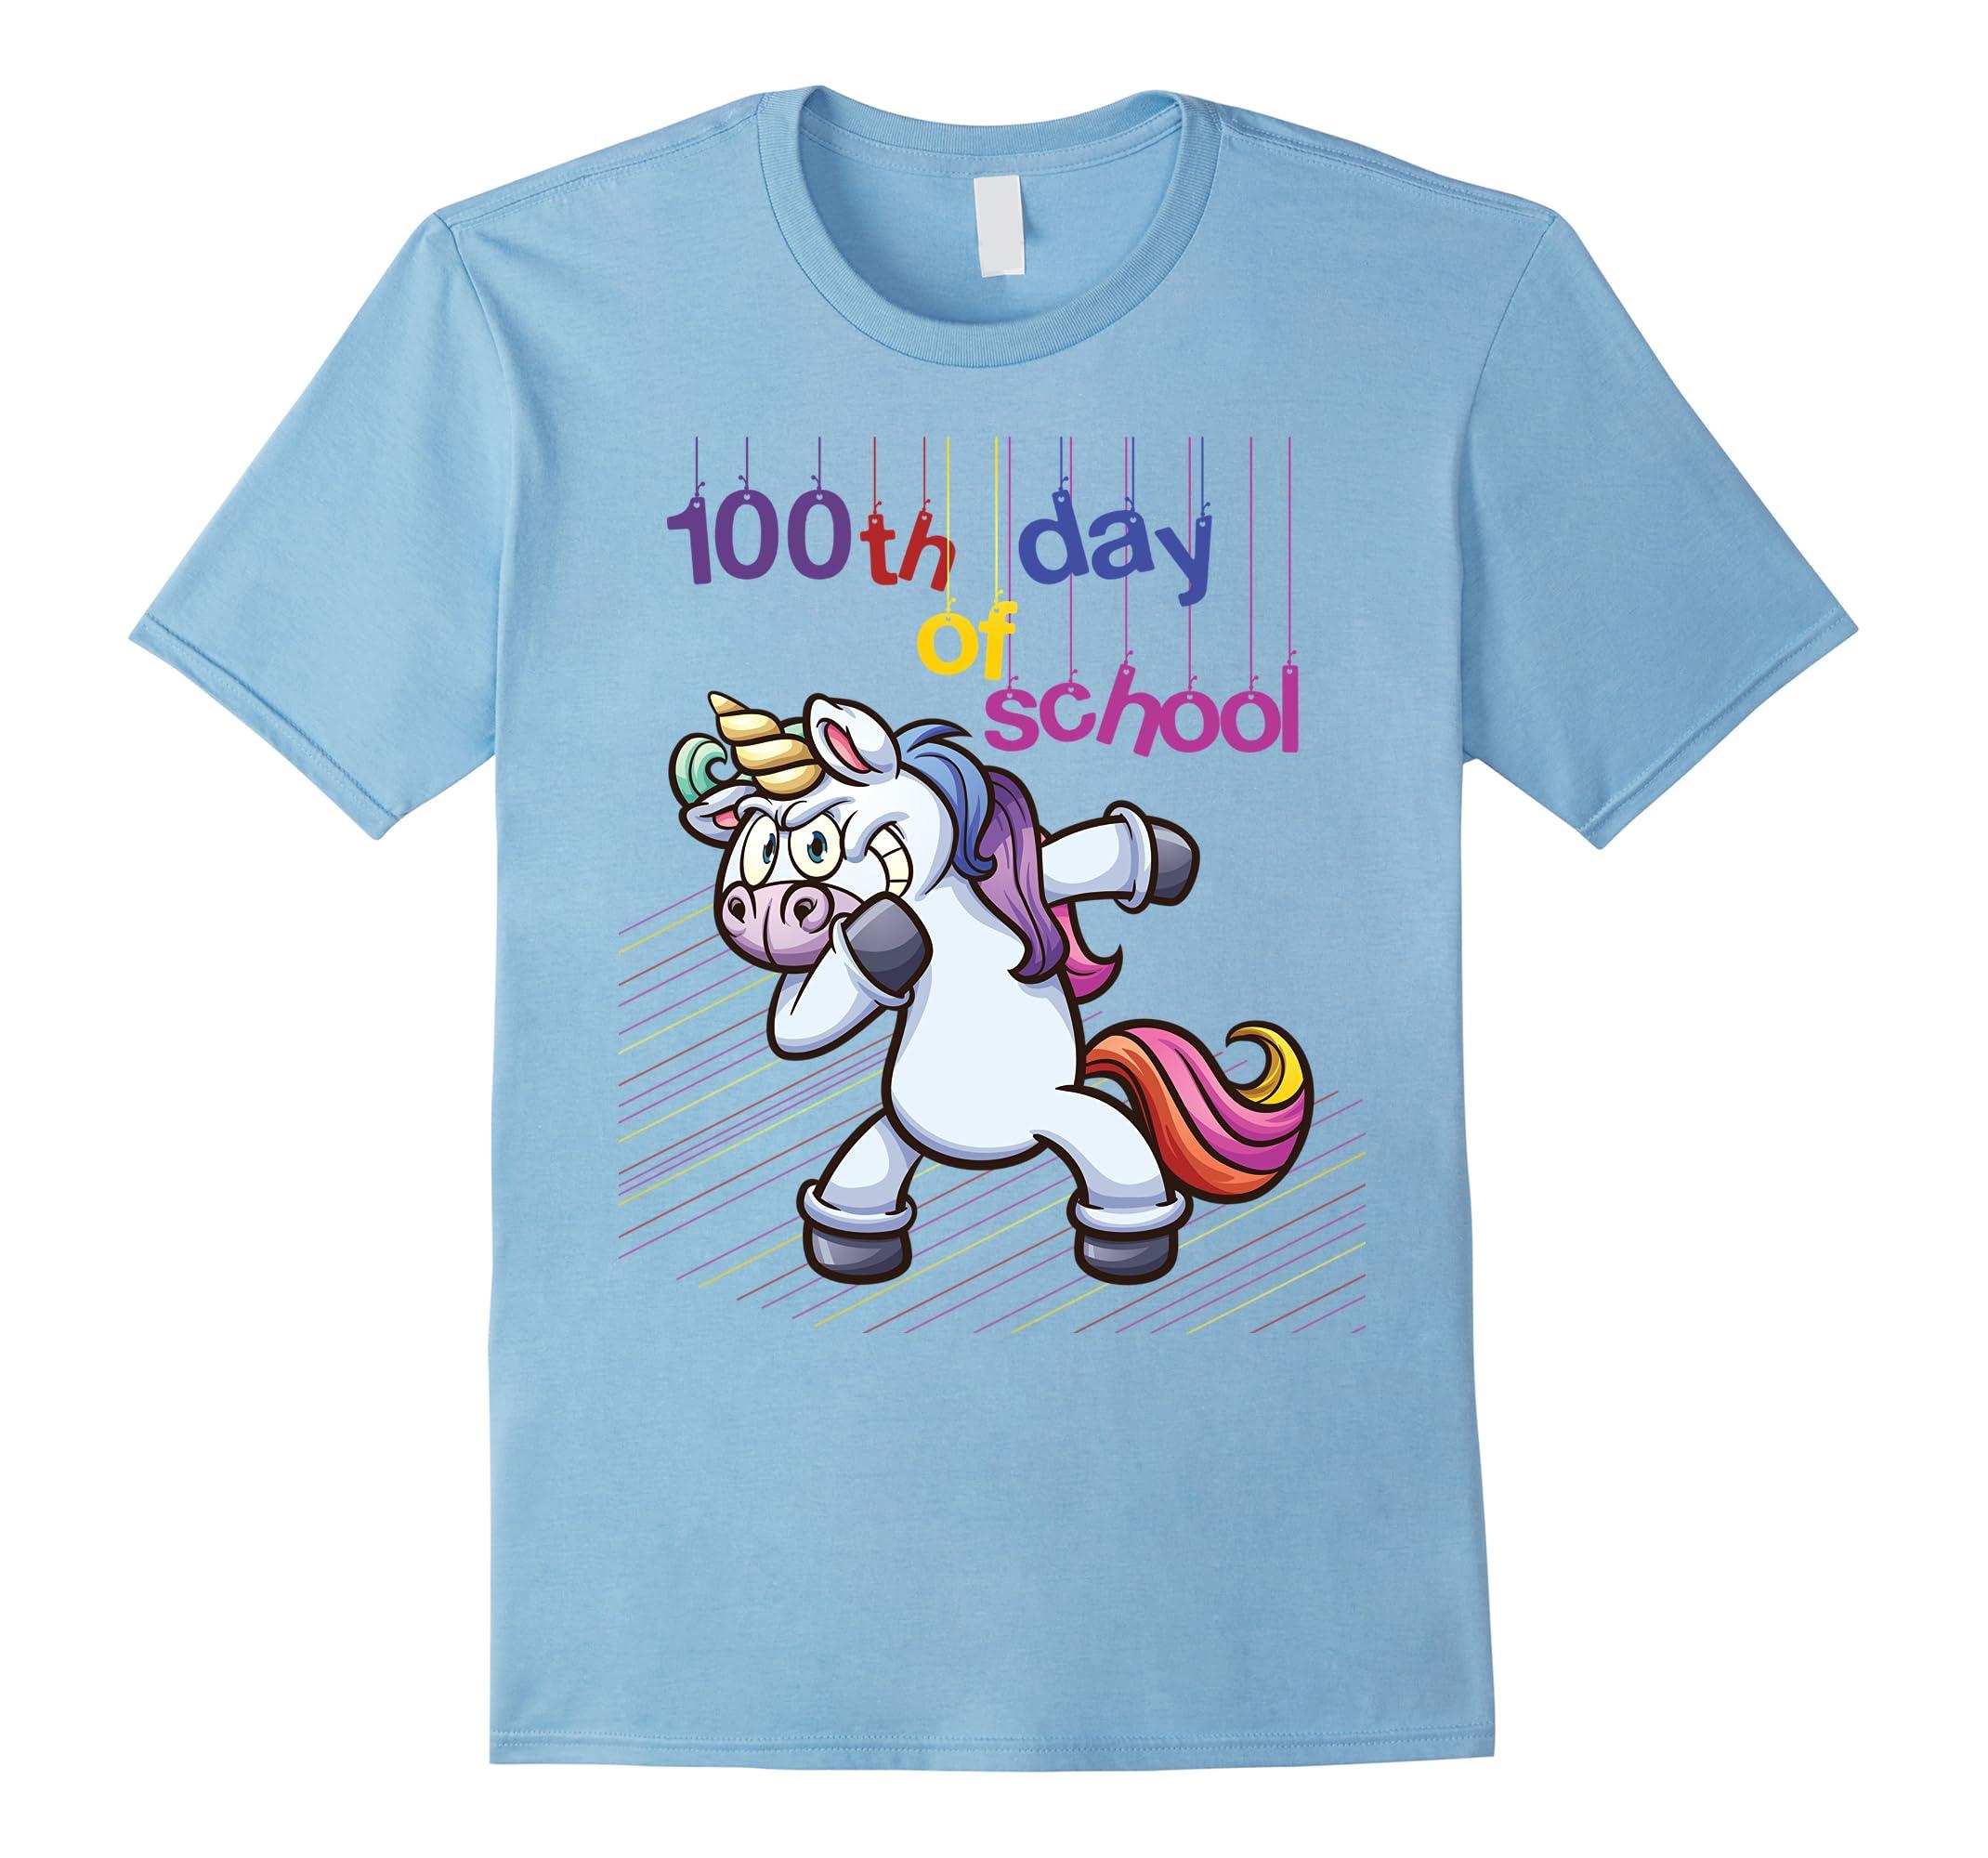 Cool Unicorn Dabbing shirt - 100th day of school-RT